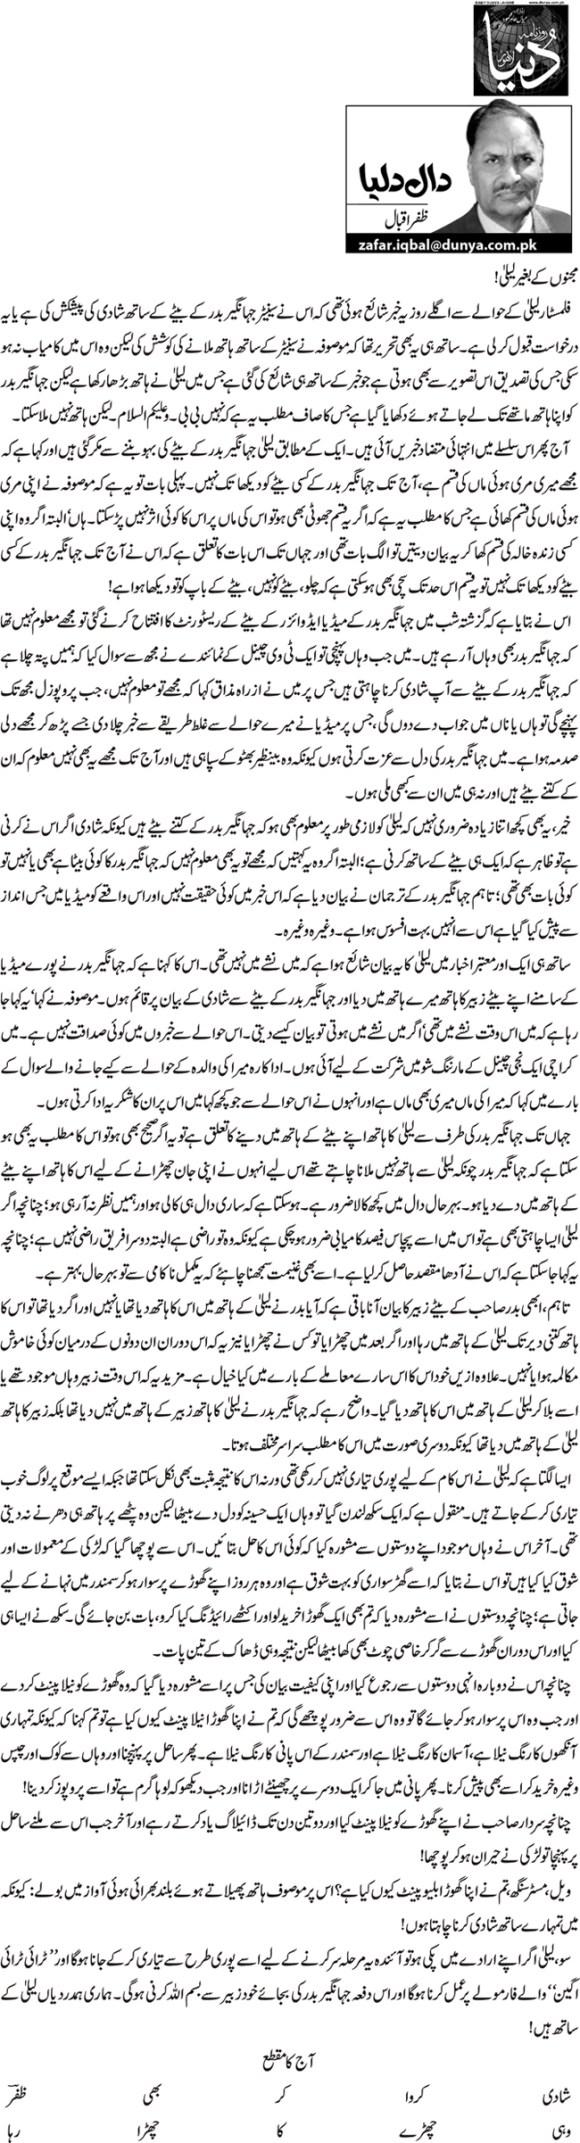 Majnu k baghair Laila! - Zafar Iqbal